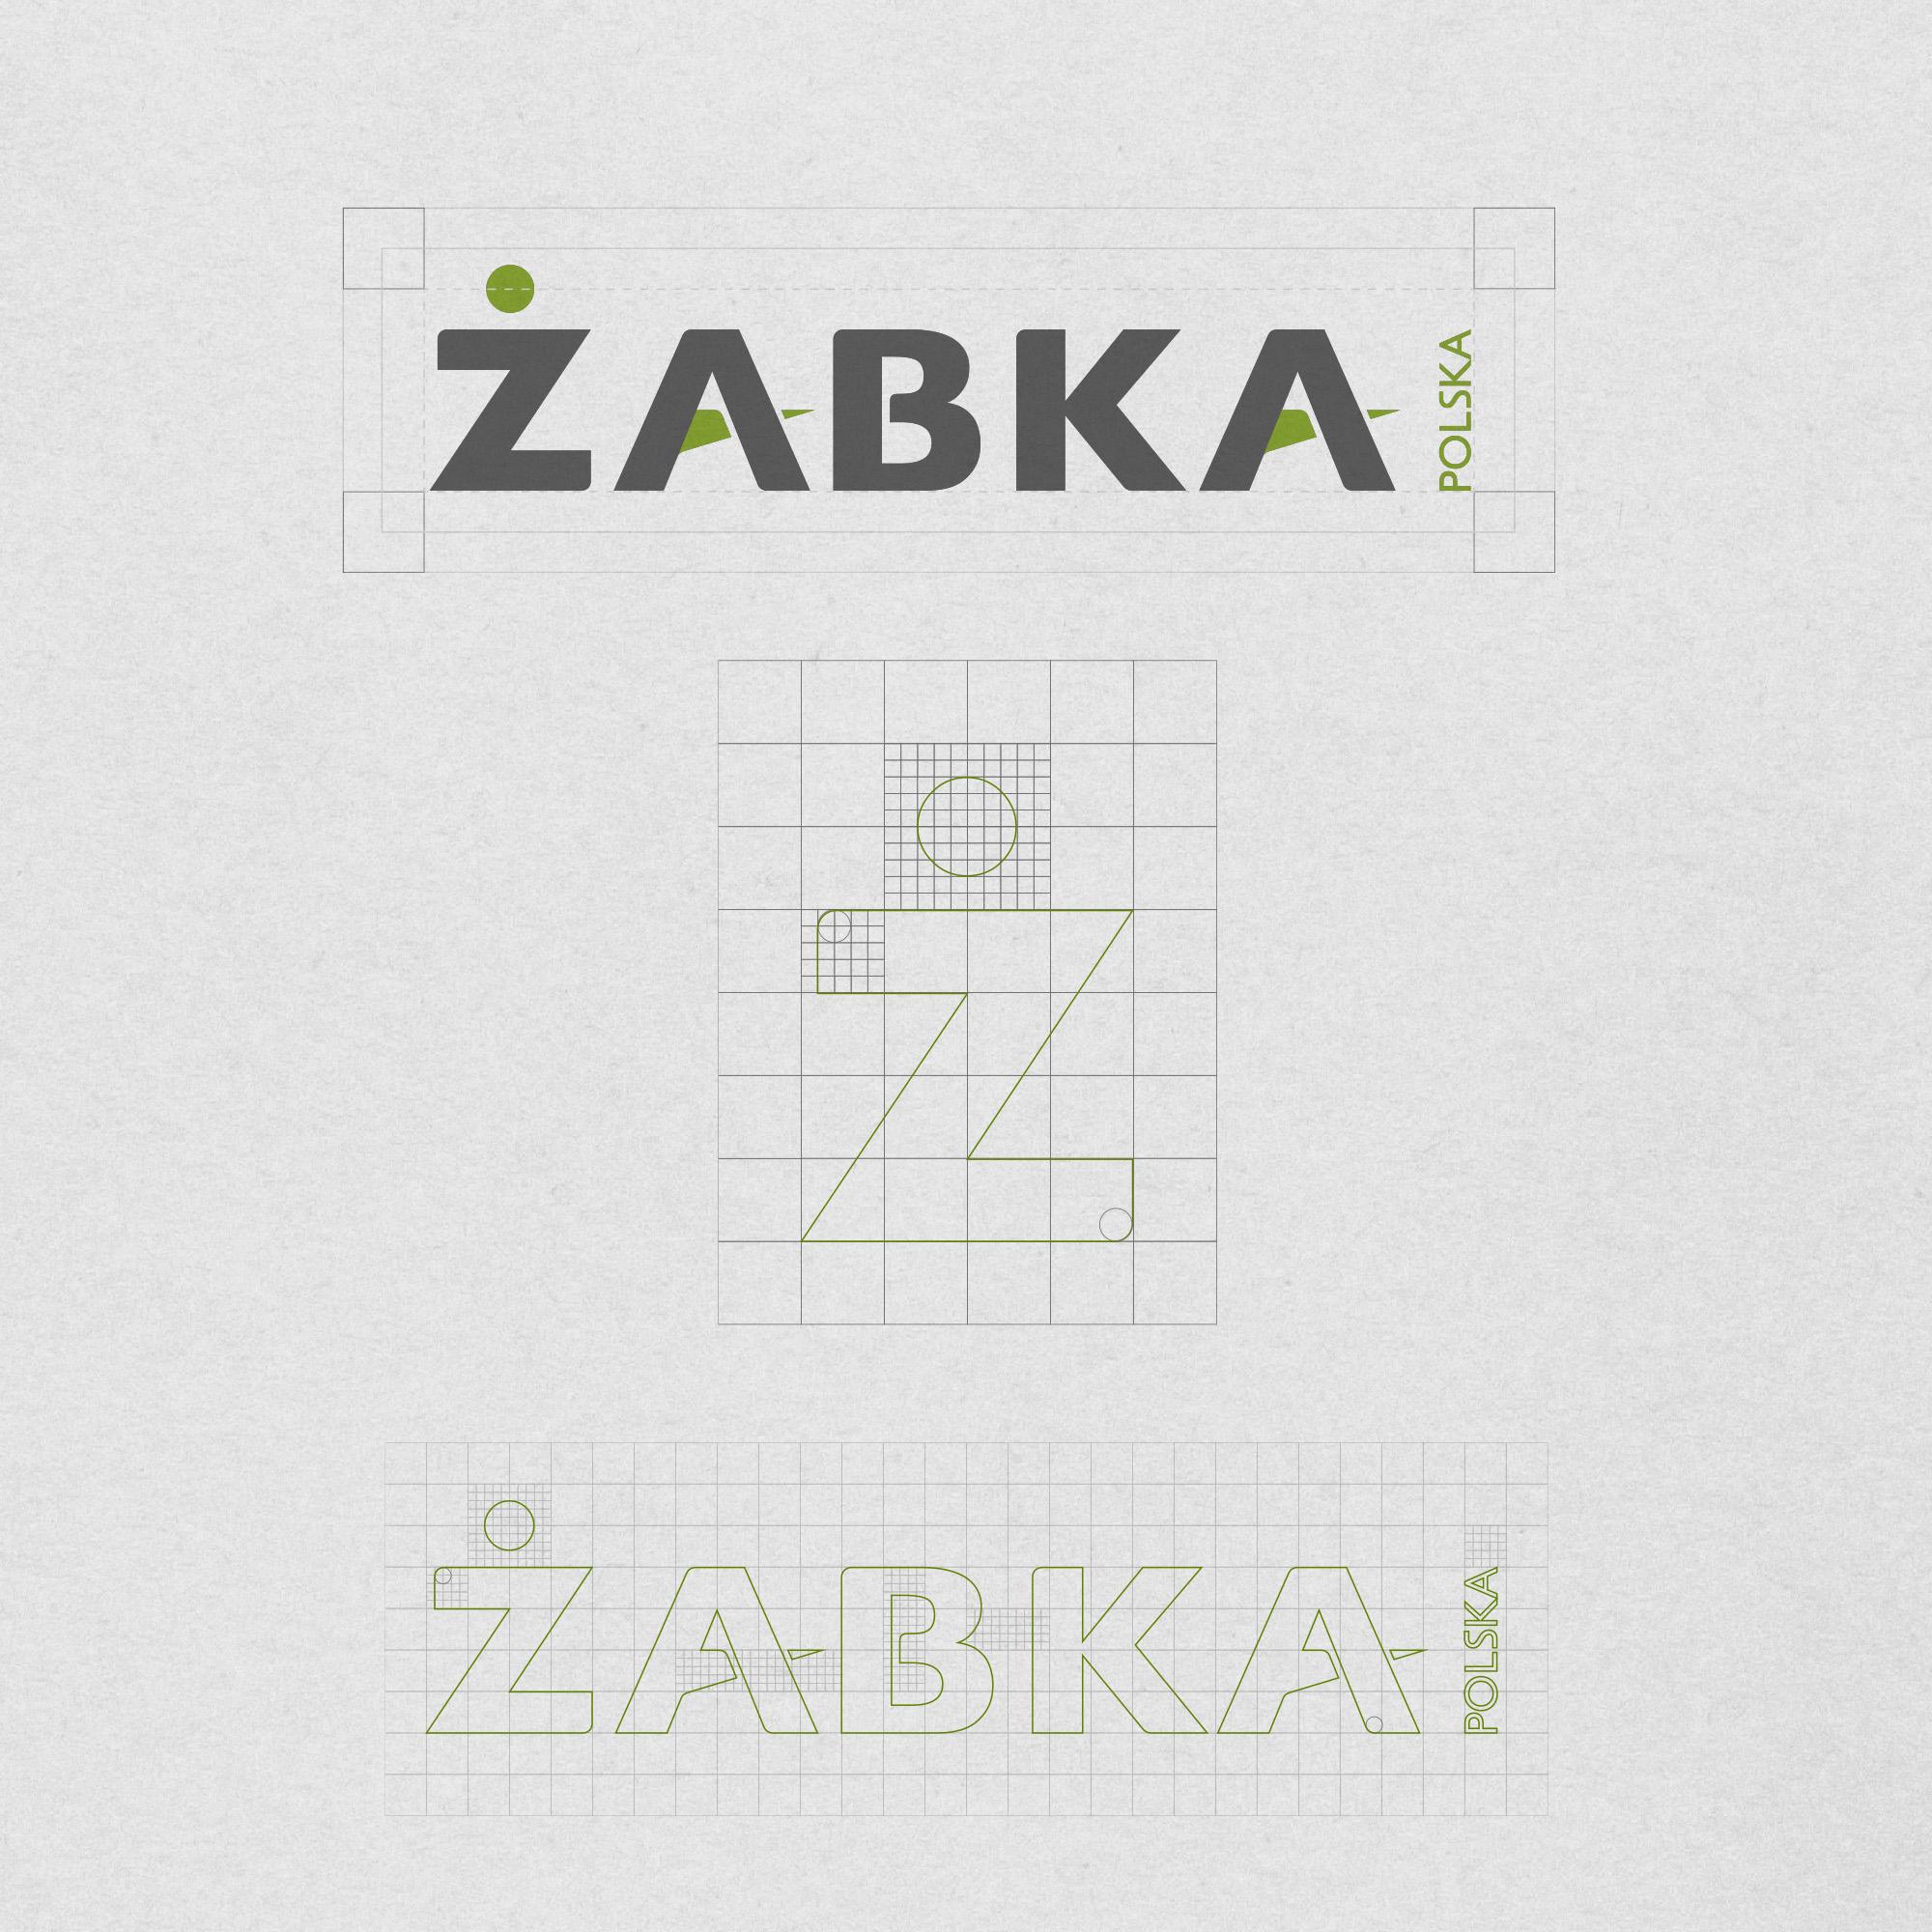 logo design, identyfikacja marki, branding, brand book, znak graficzny, logo firmy, ci, Żabka Polska, art designer - Ireneusz Bloch